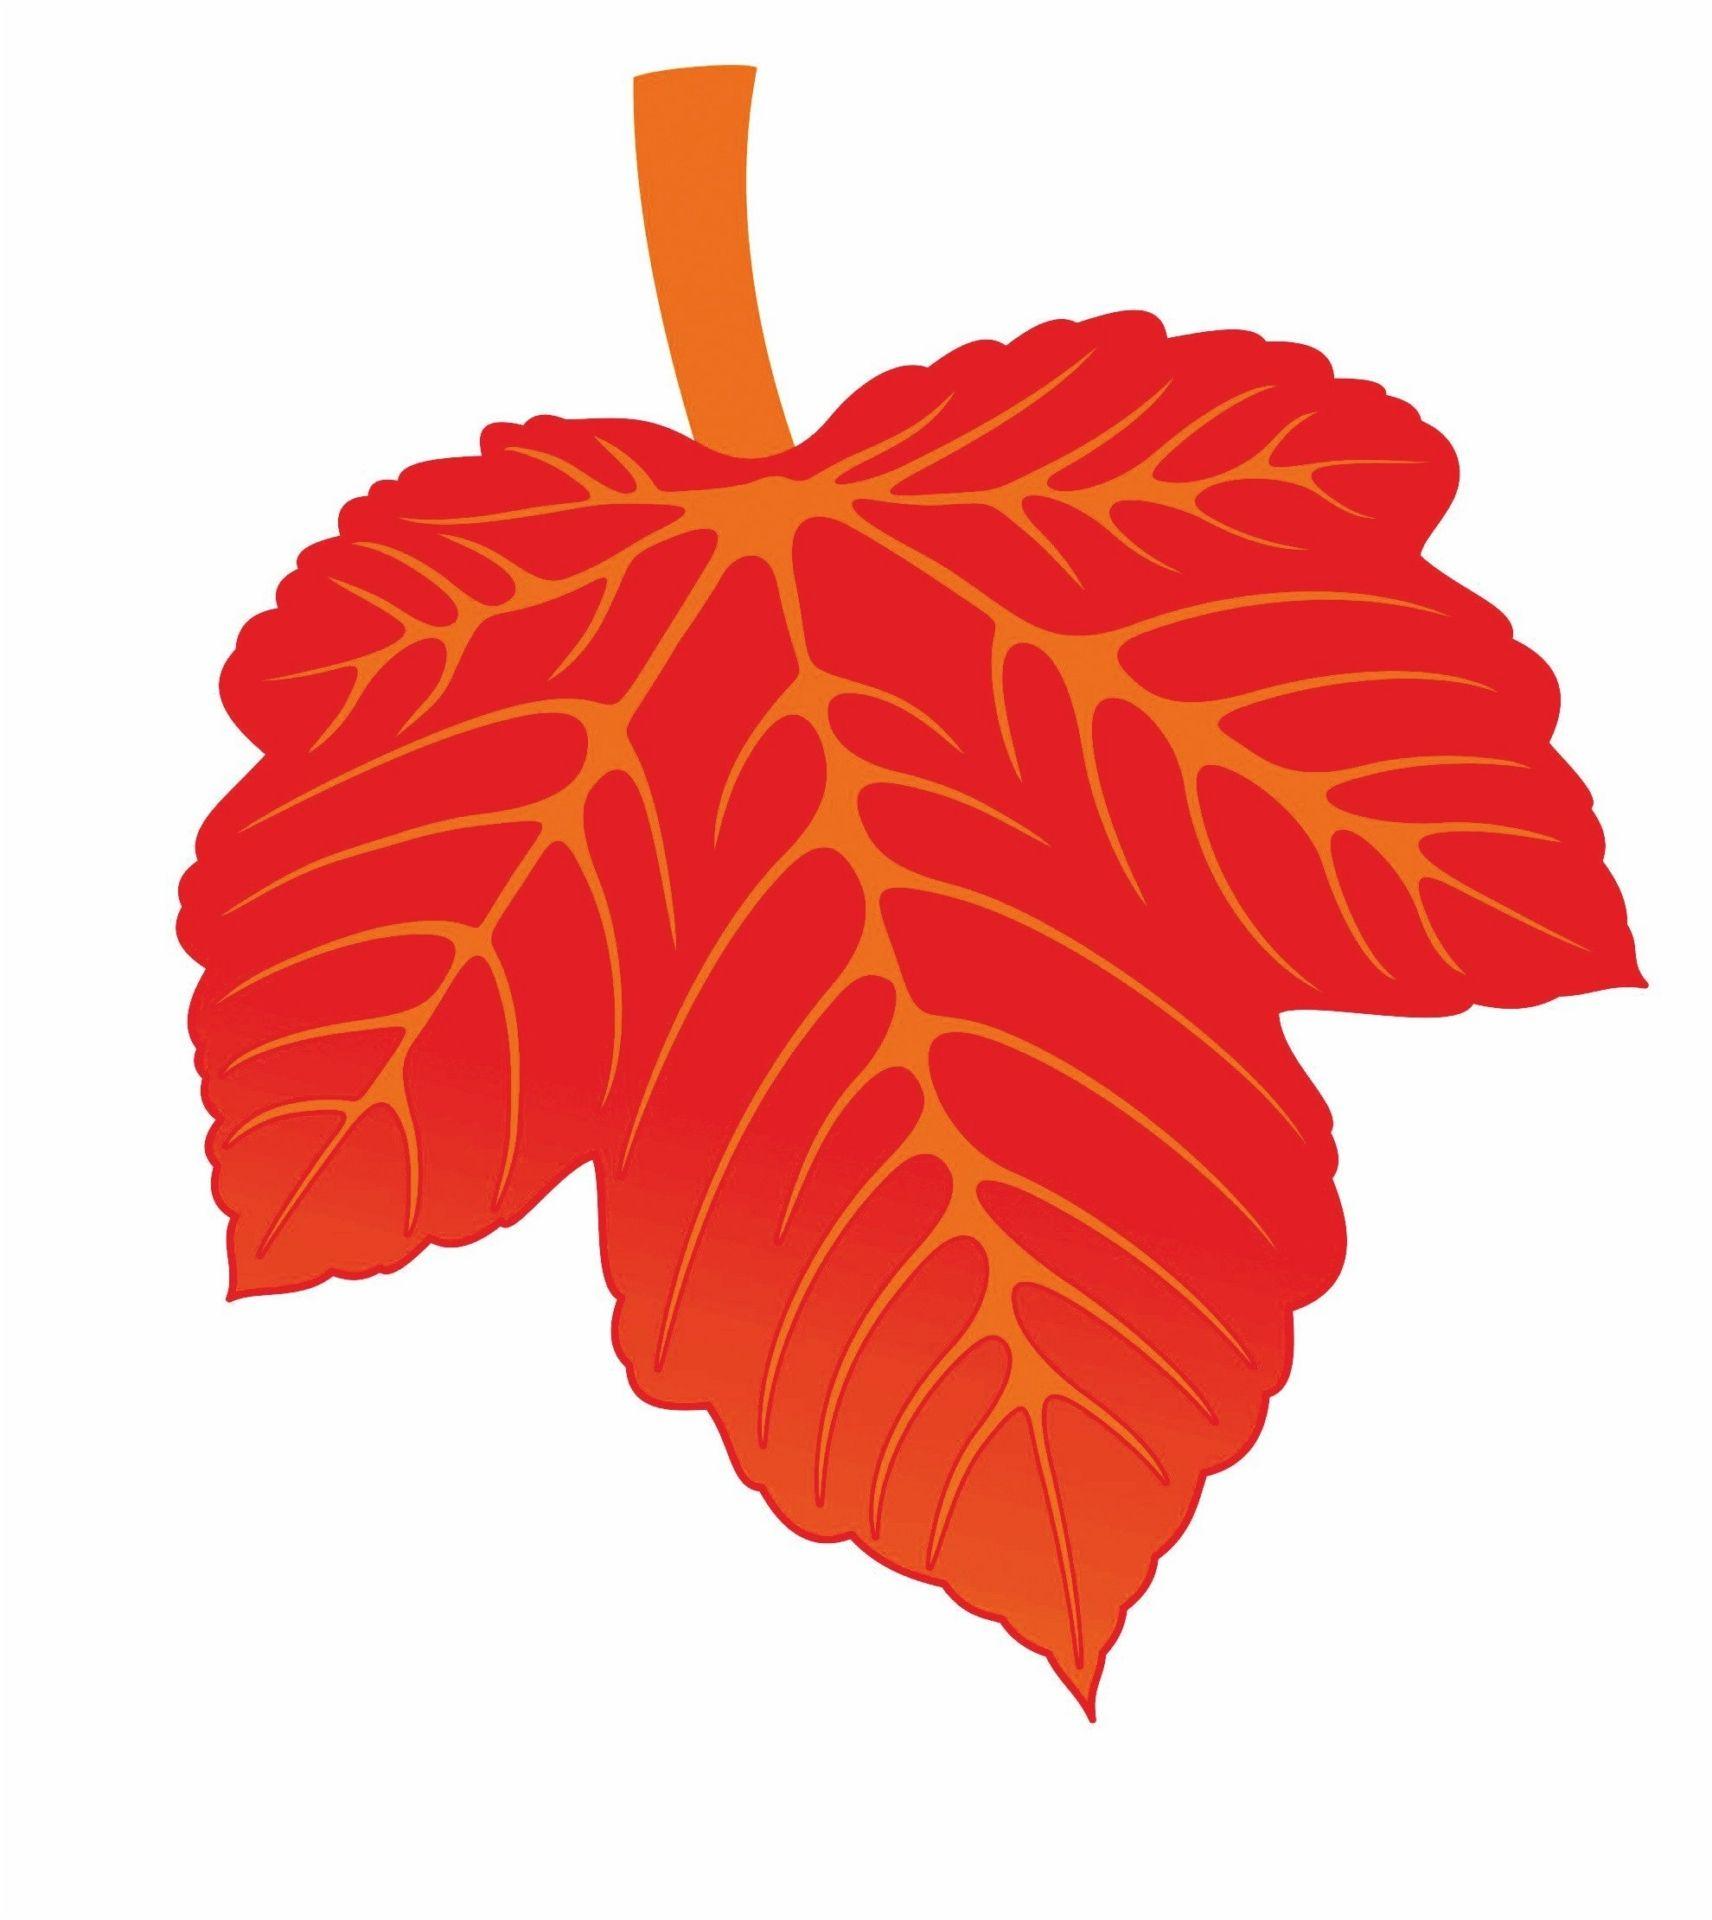 Мини-плакат вырубной Лист винограда красный: 134х155 ммВырубные фигуры<br>.<br><br>Год: 2018<br>Серия: Вырубные фигуры для оформления<br>Высота: 155<br>Ширина: 134<br>Переплёт: набор